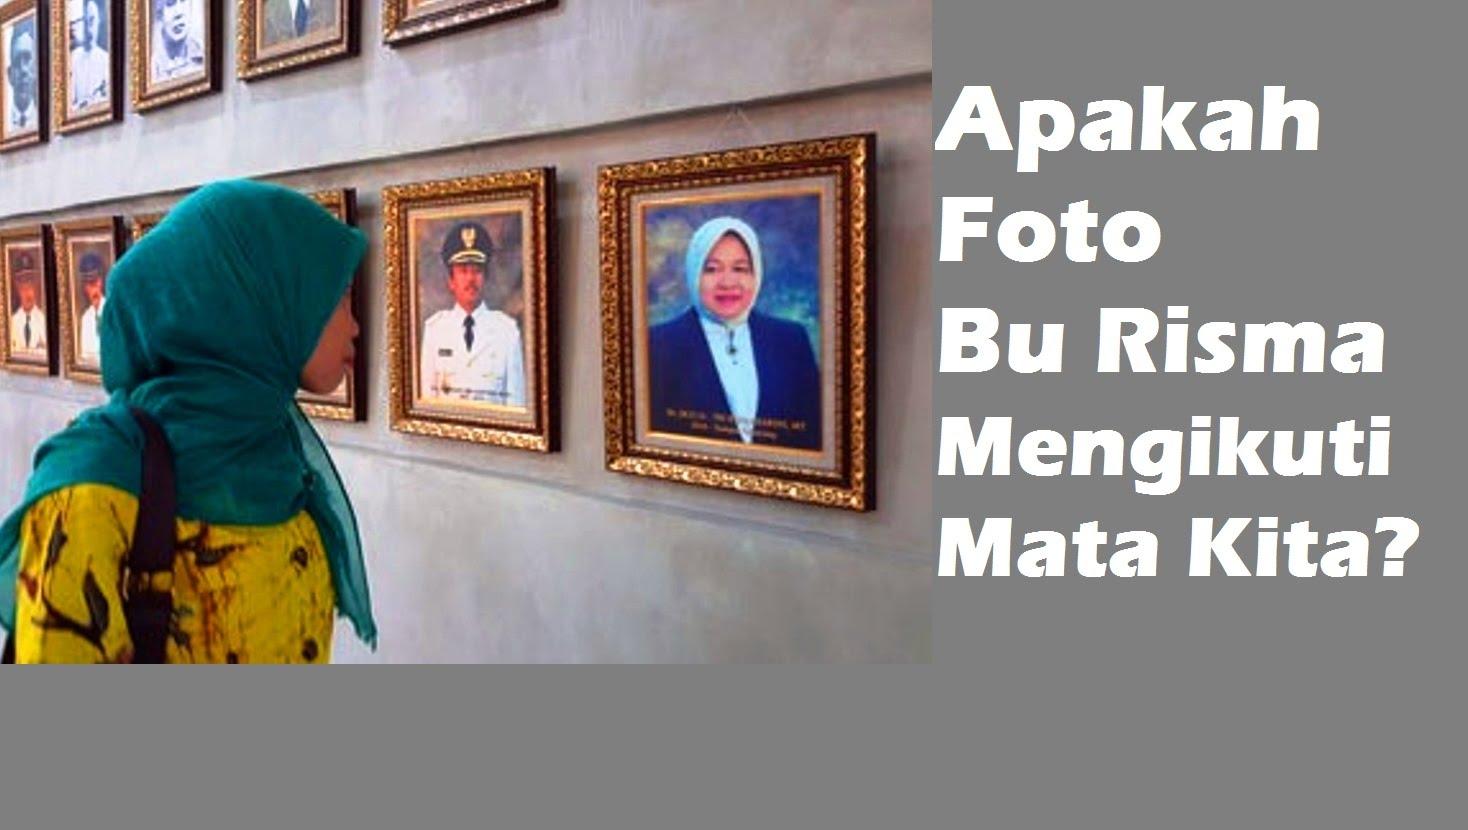 Foto Wali Kota Risma Museum Surabaya Konon Aneh Penasaran Youtube